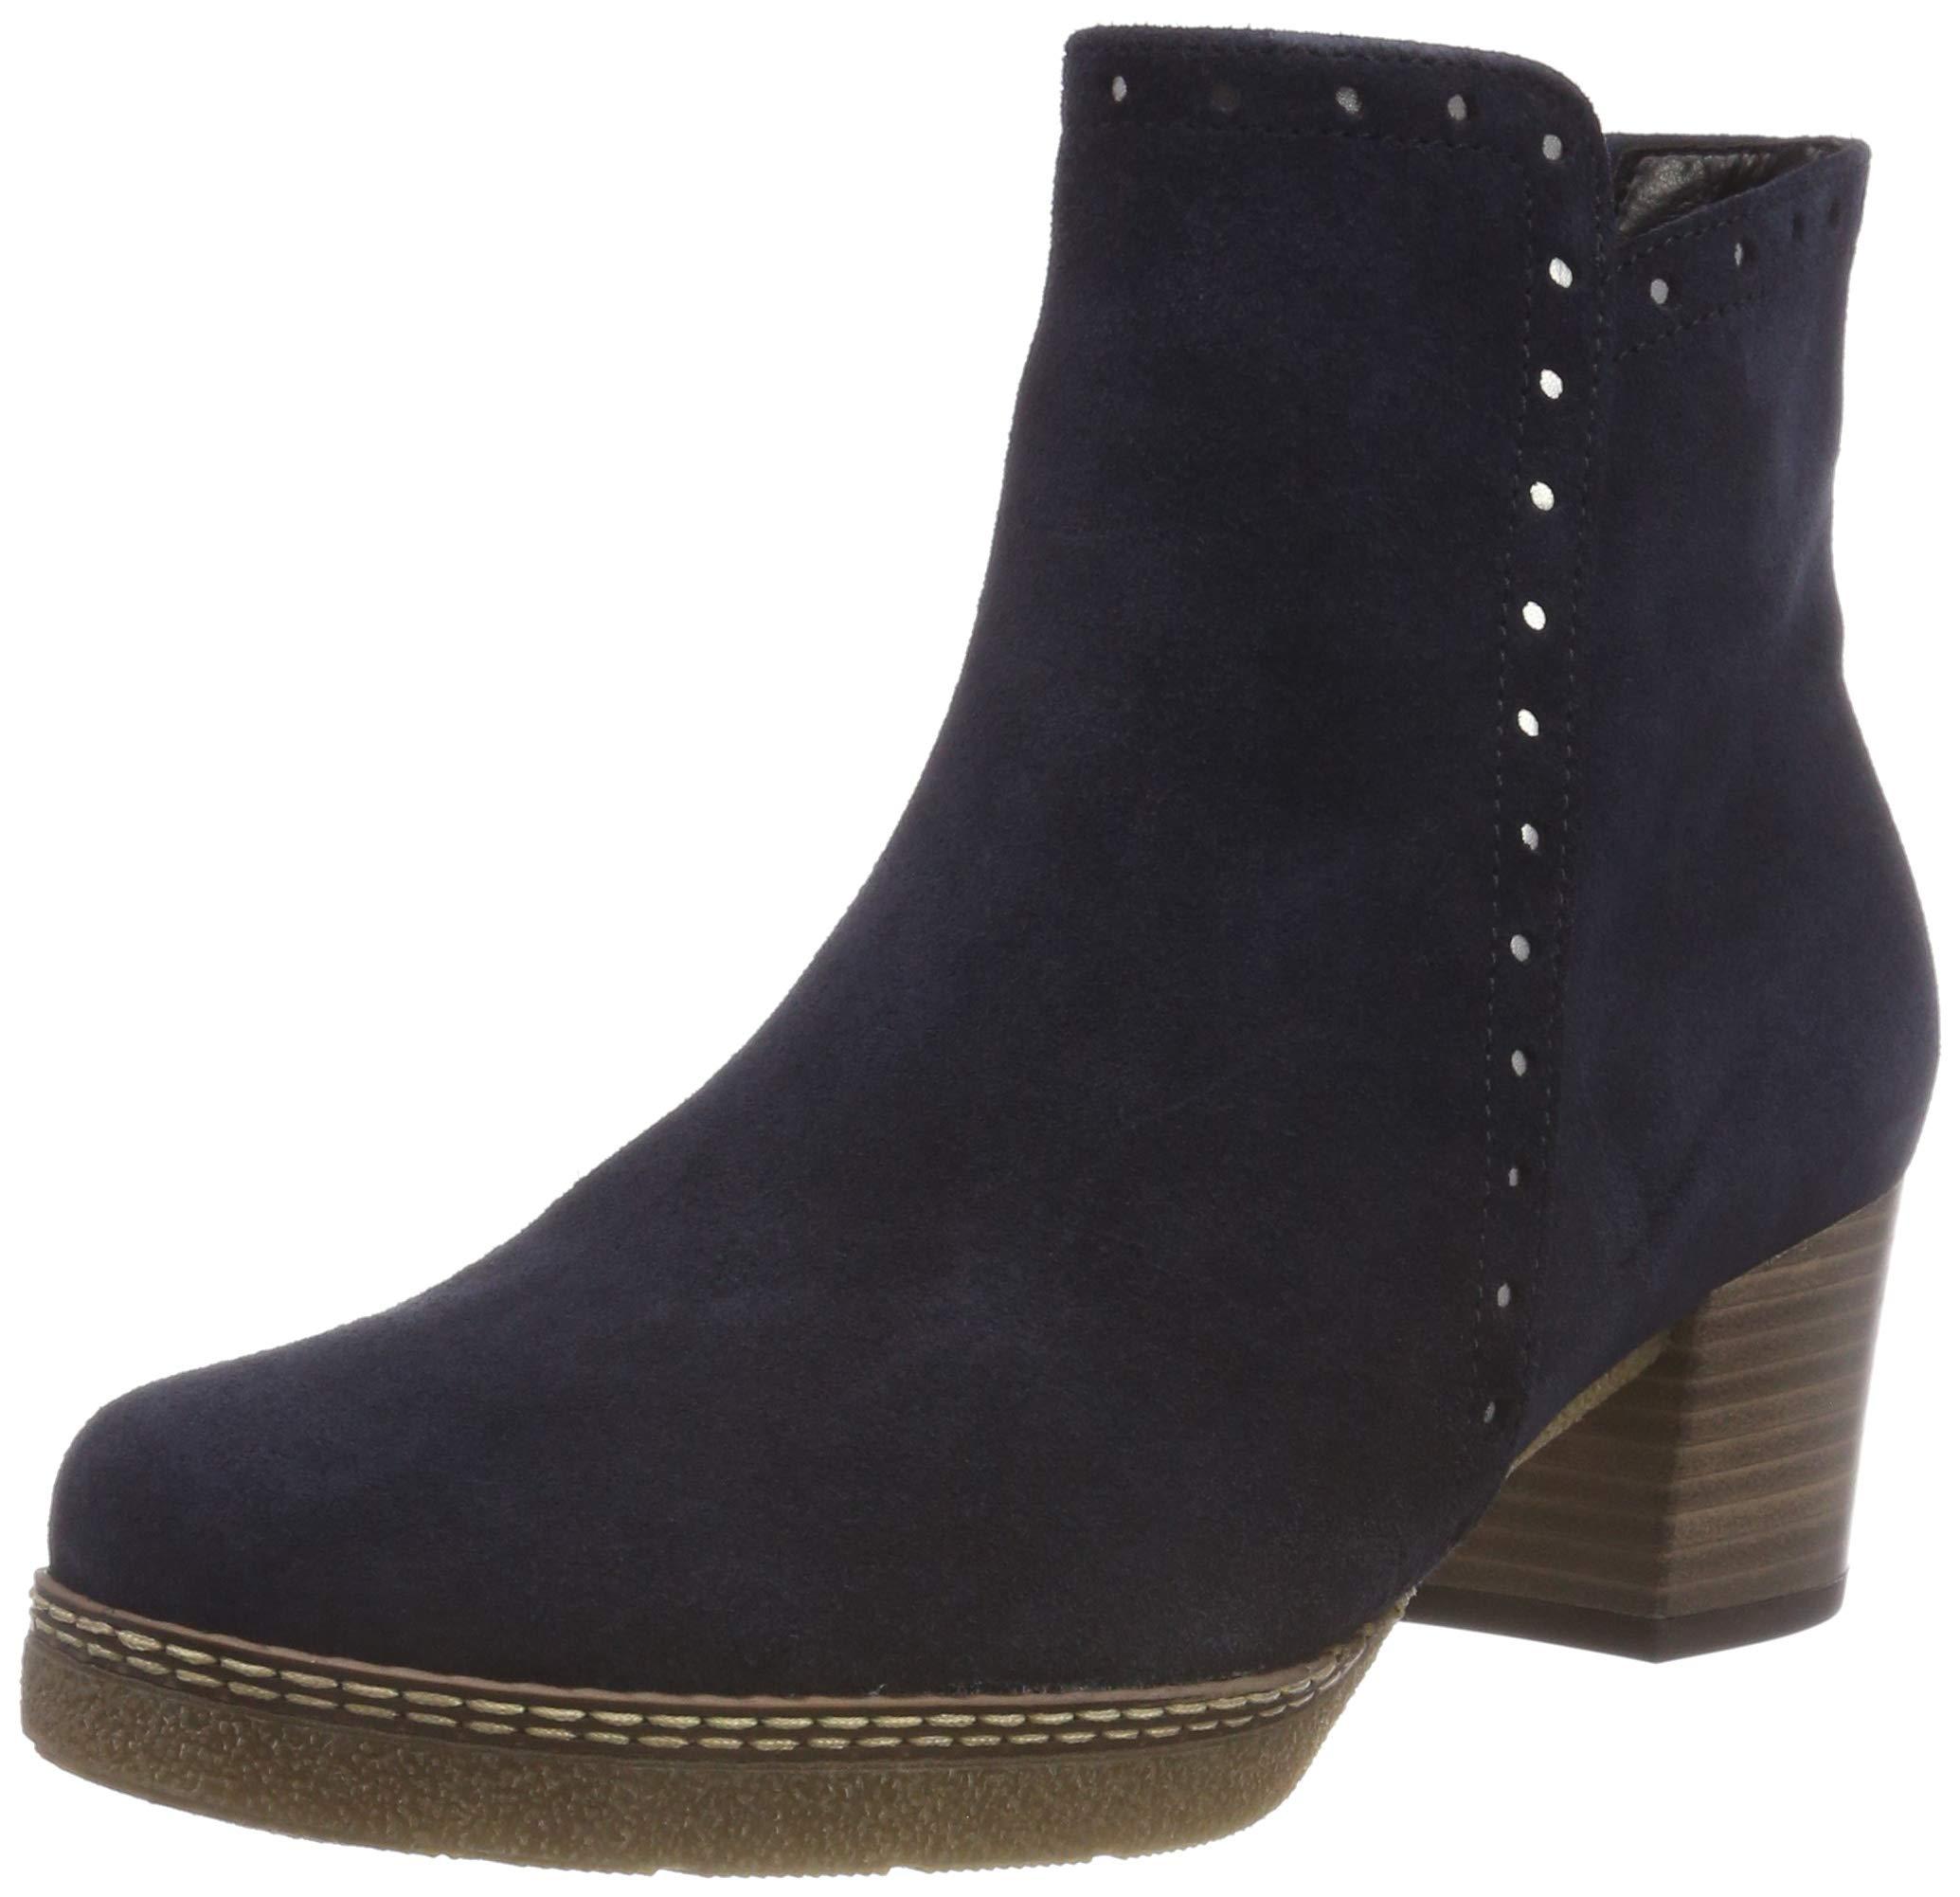 Gabor FemmeBleuoceanmicro4641 Shoes Eu Comfort BasicBotines 0OnPk8w